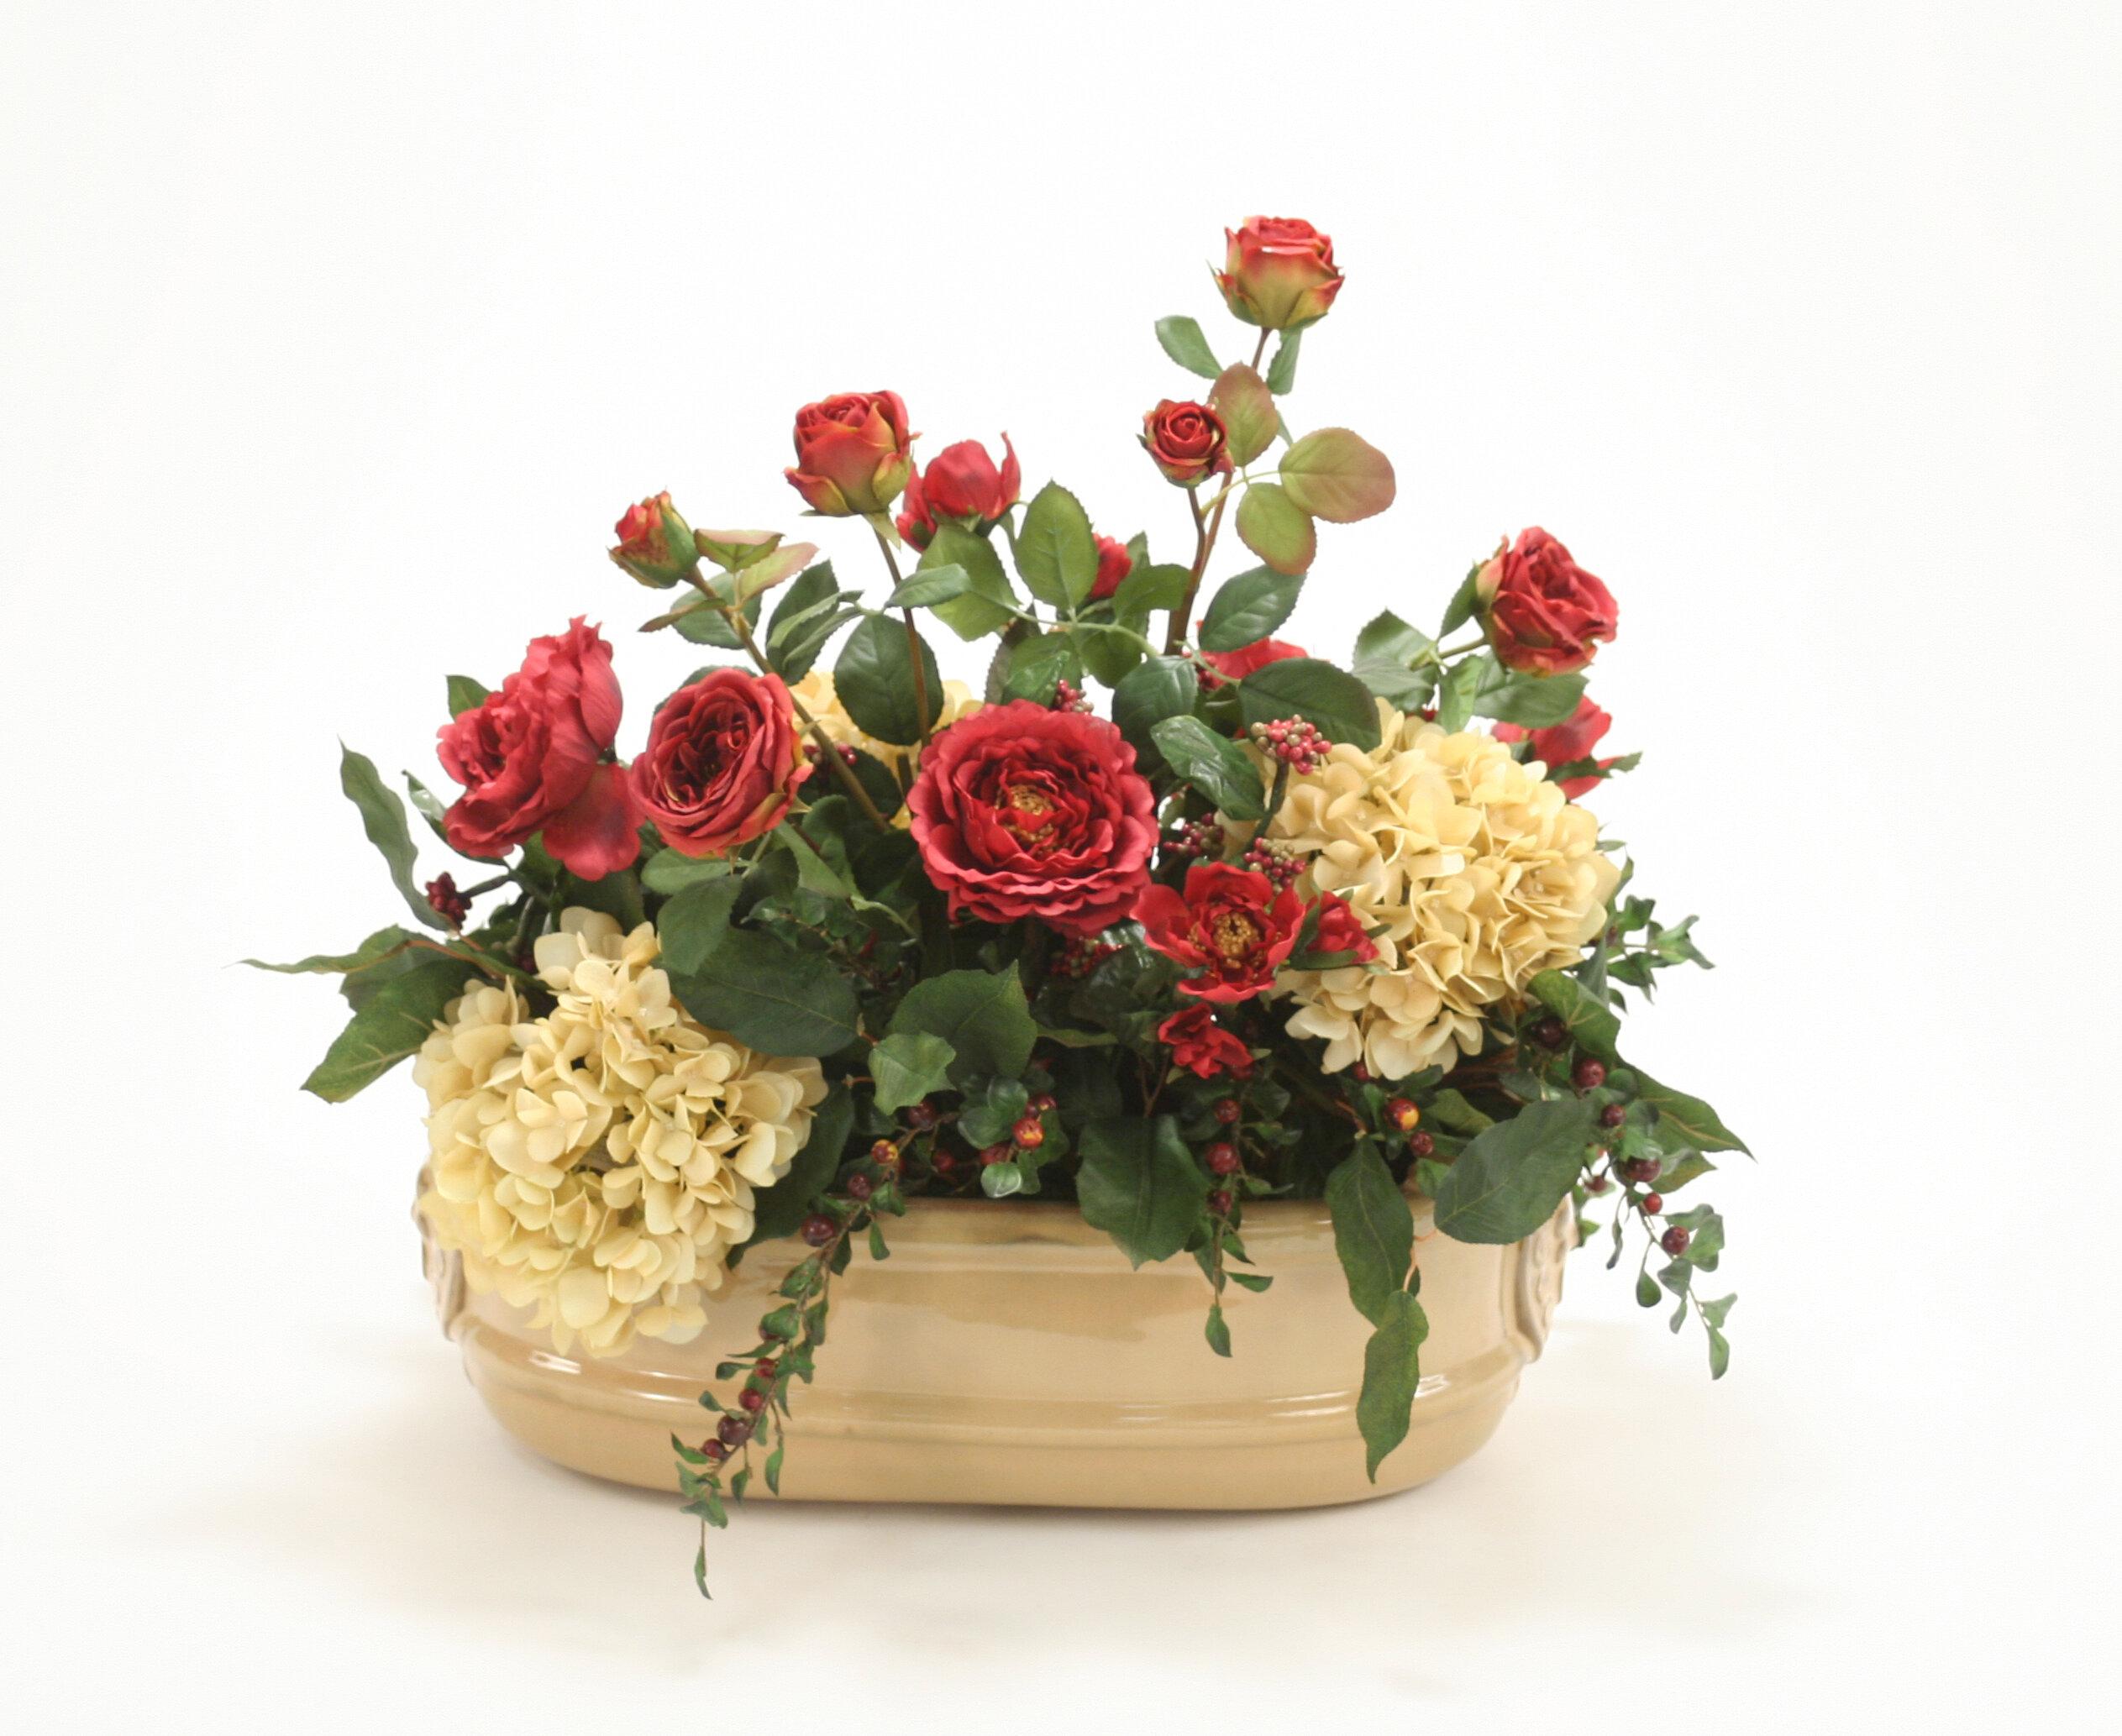 Distinctive Designs Mixed Floral Arrangements In Planter Wayfair